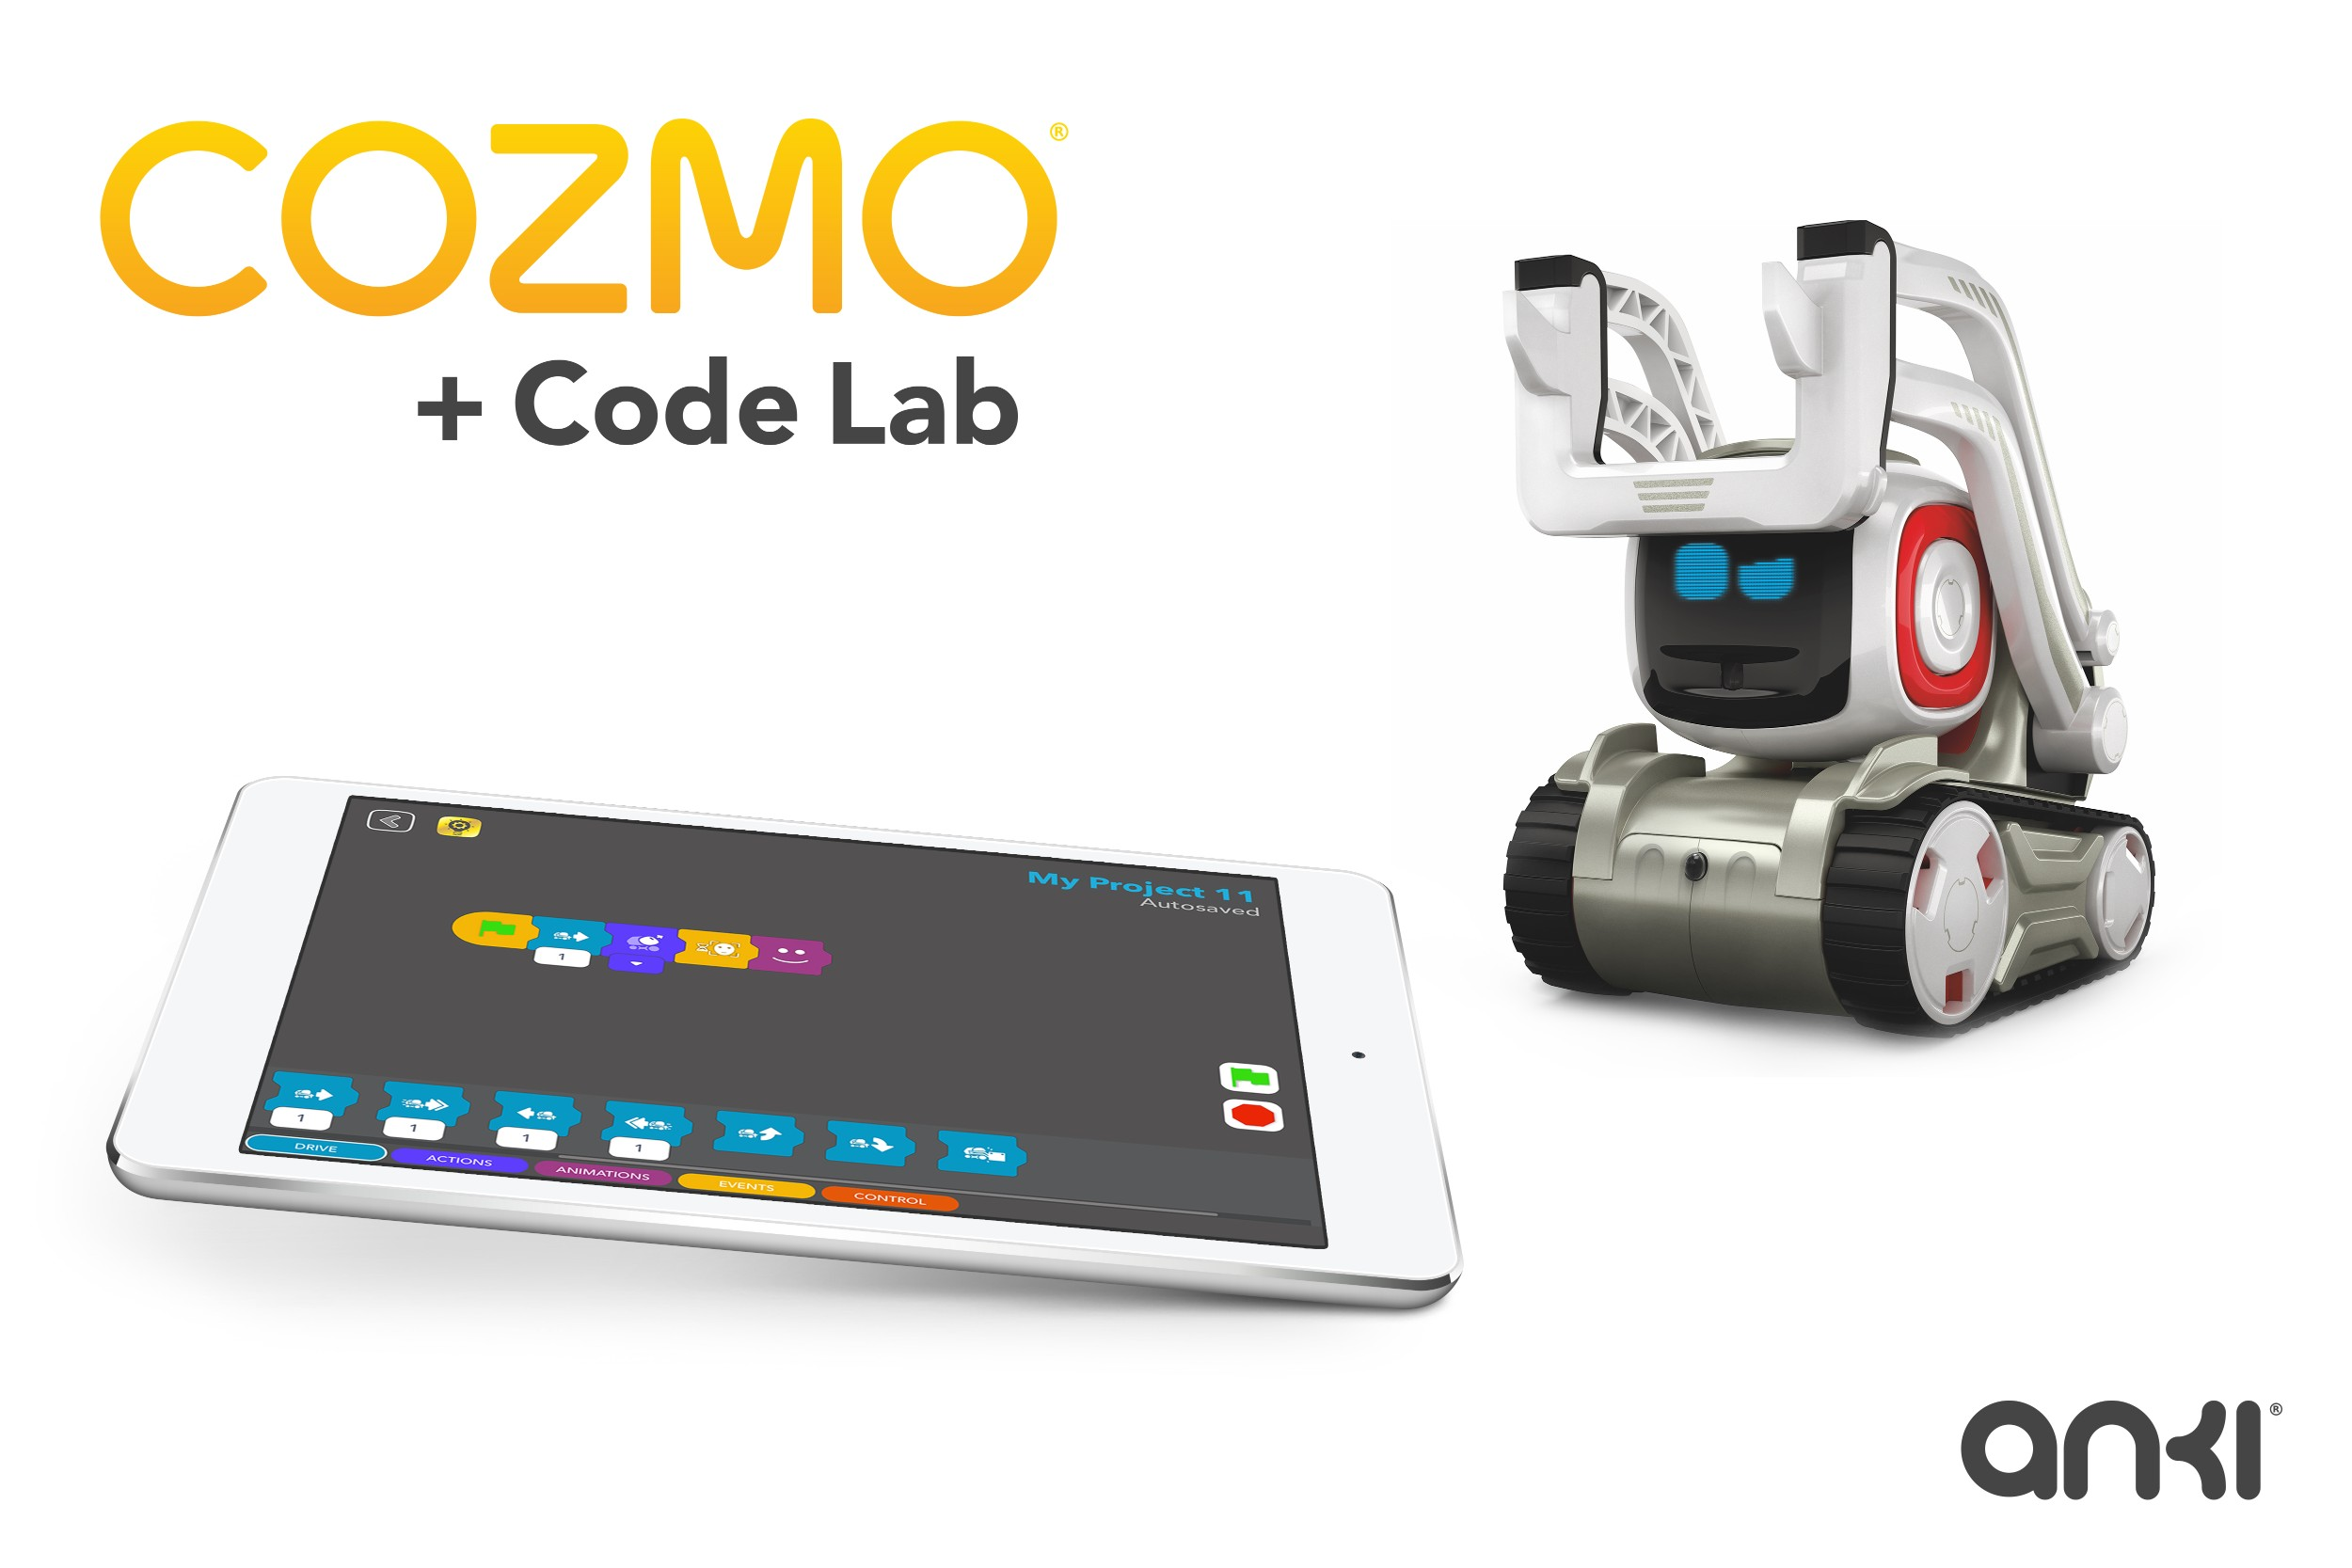 cozmo-code-lab-infos-prix-disponibilite-amazon-fnac